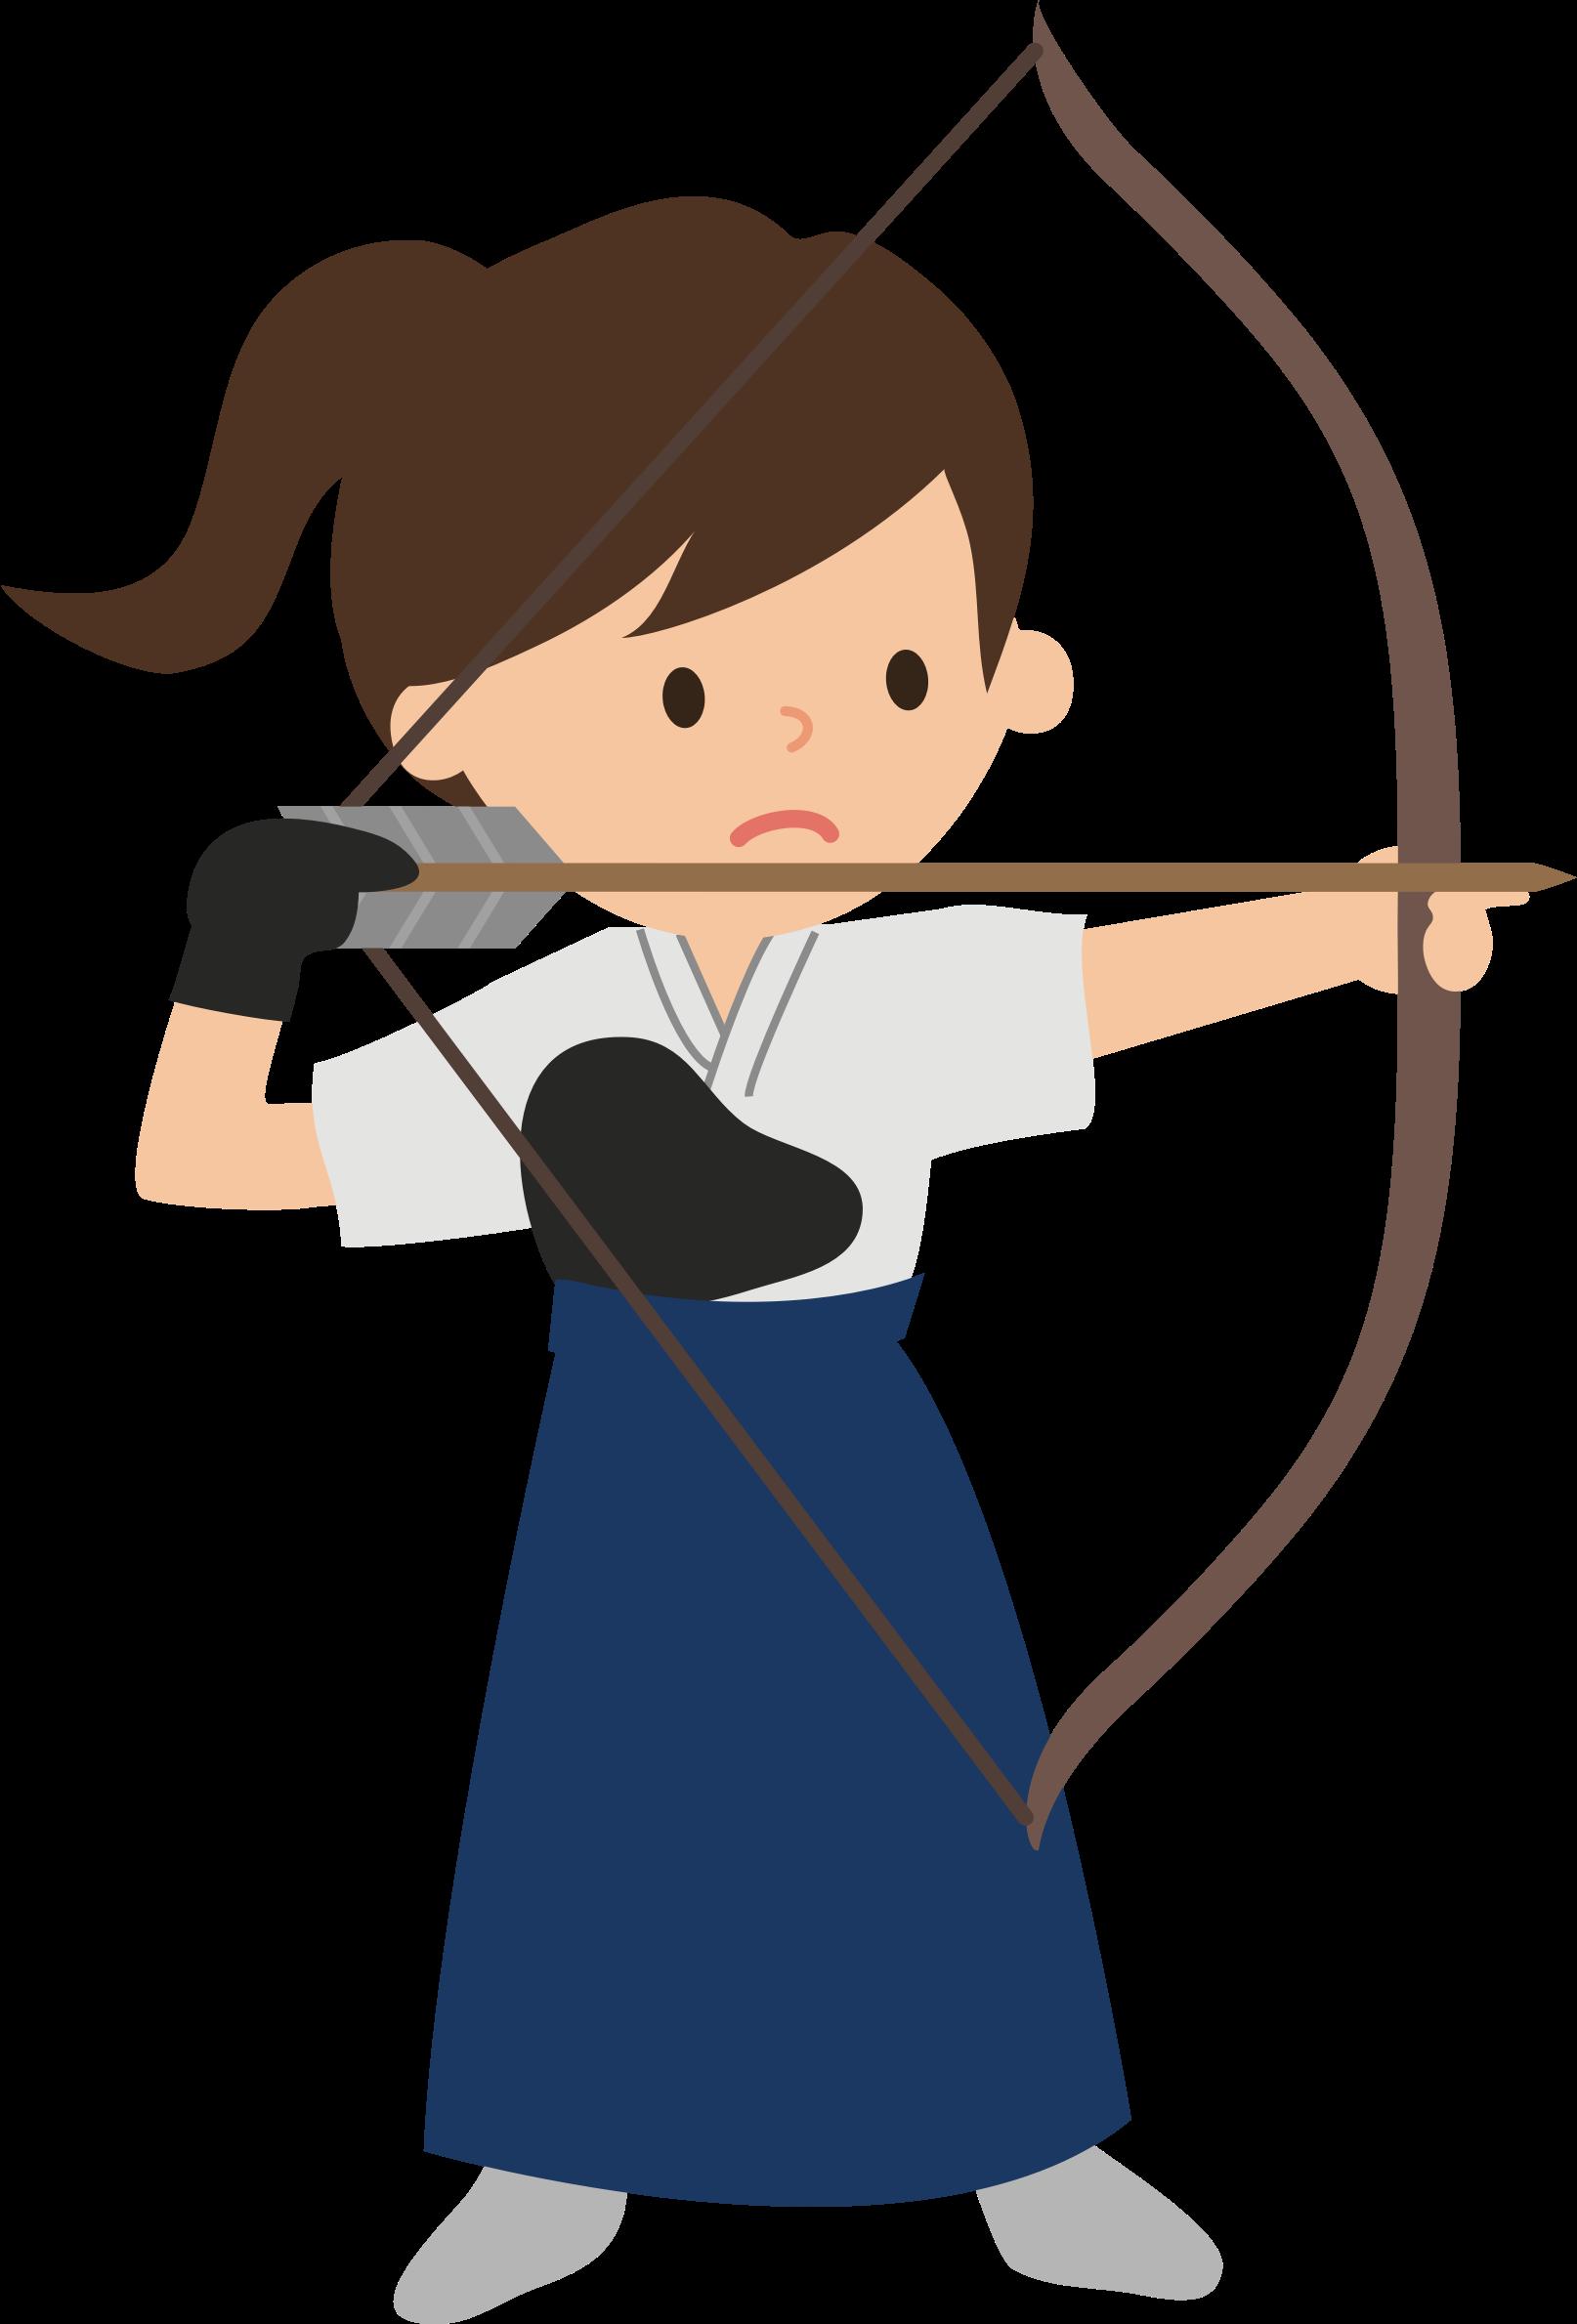 clipart Archery clipart. Female archer big image